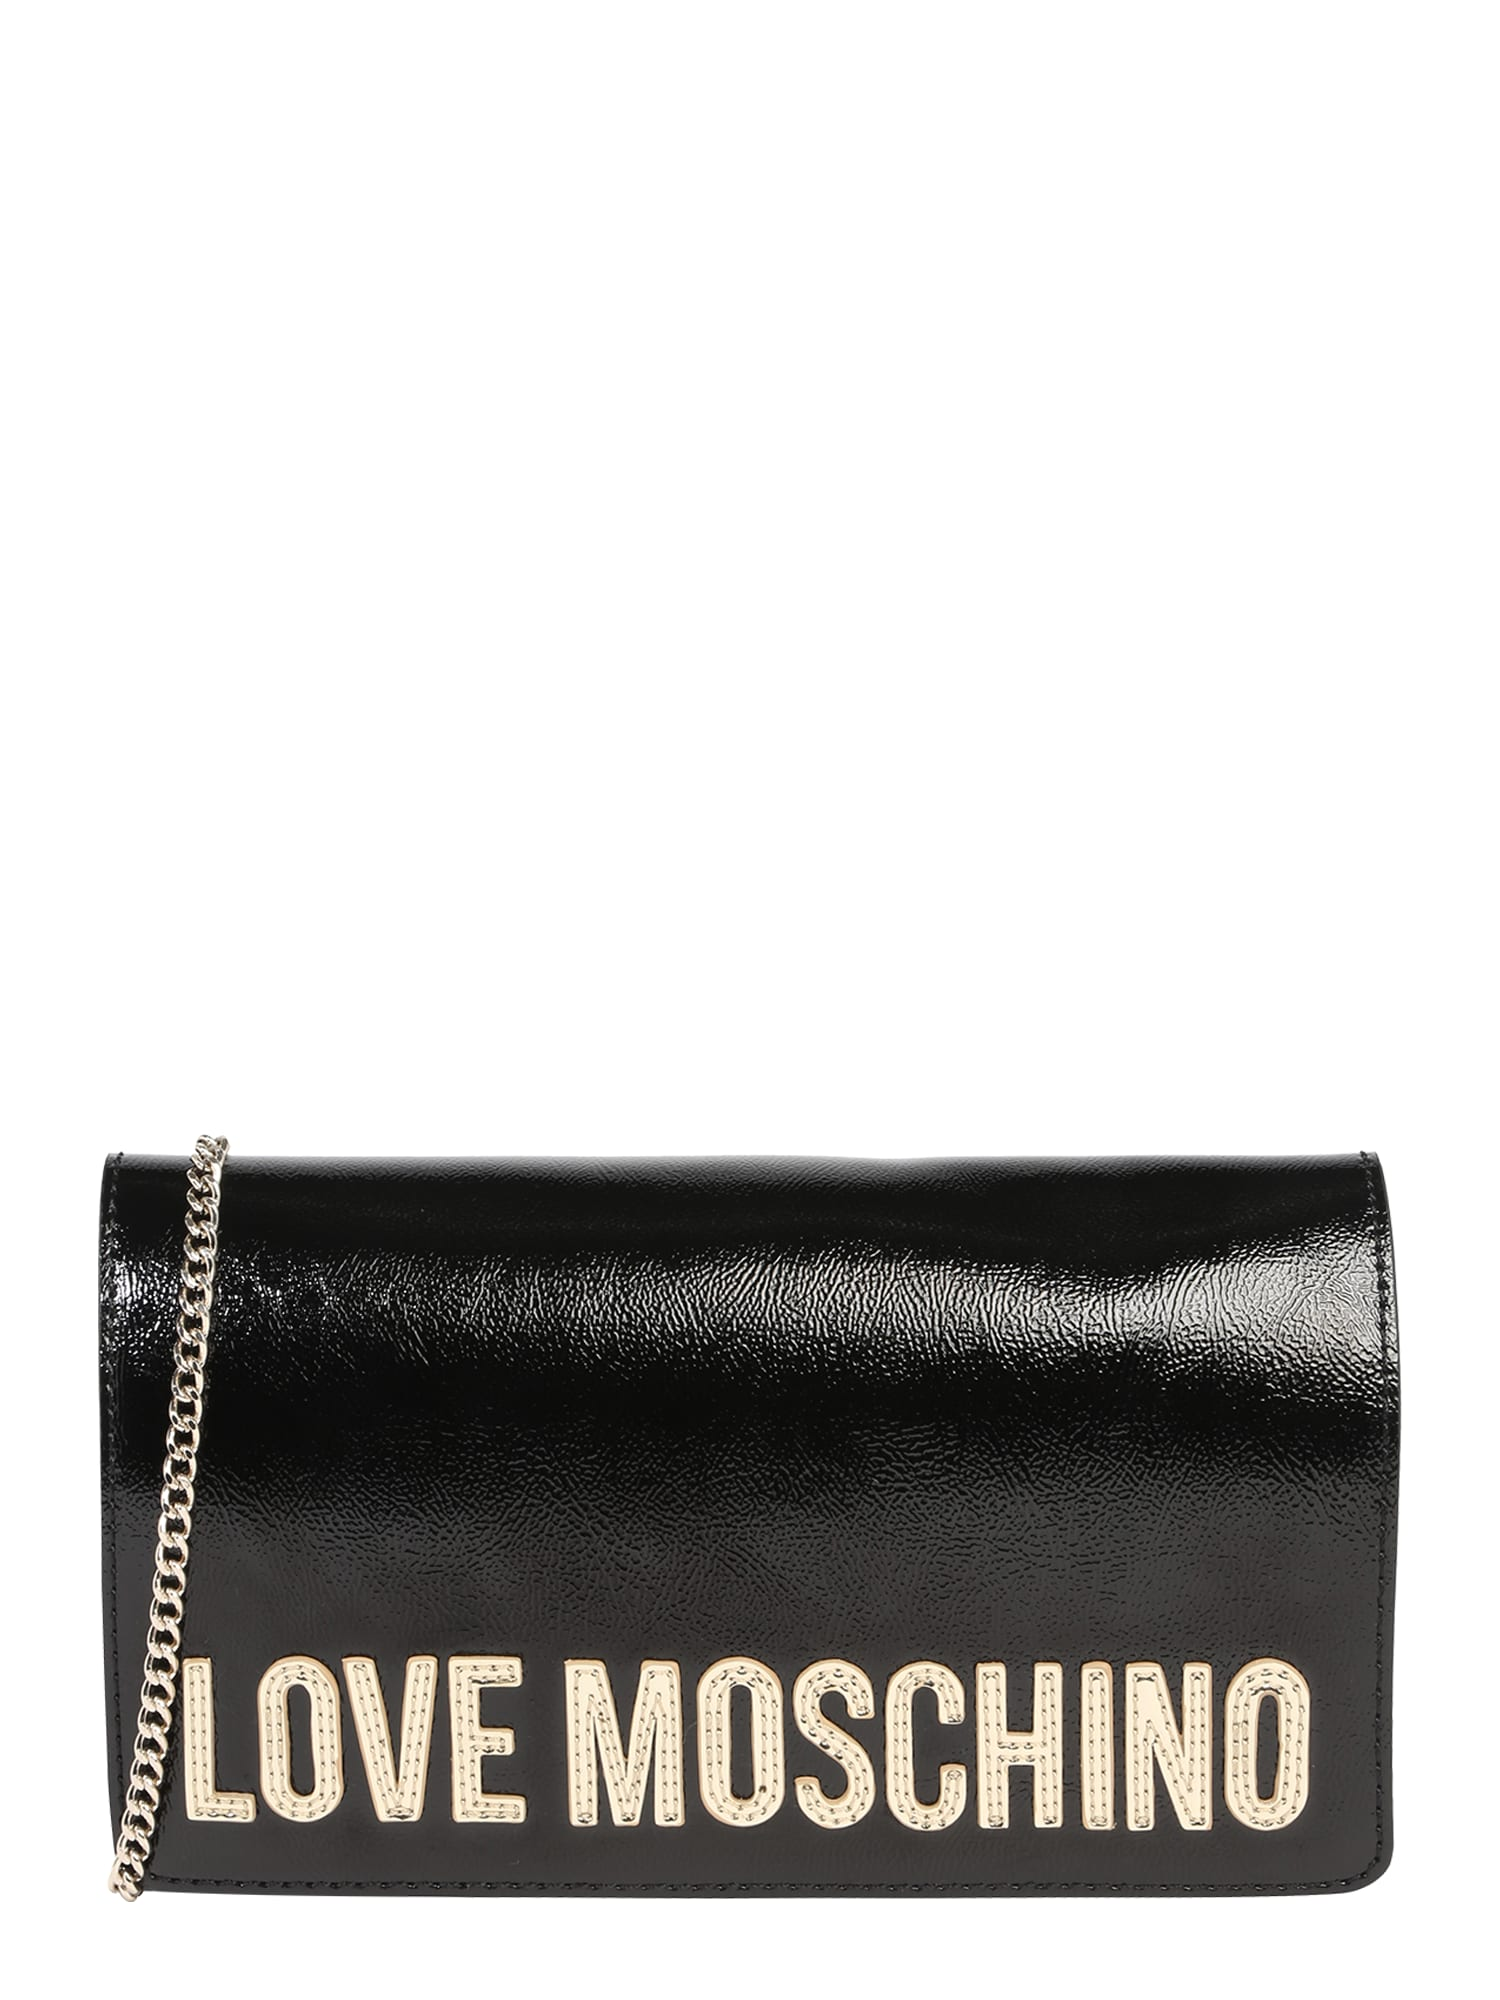 Taška přes rameno BORSA METALLIC PU NERO černá Love Moschino